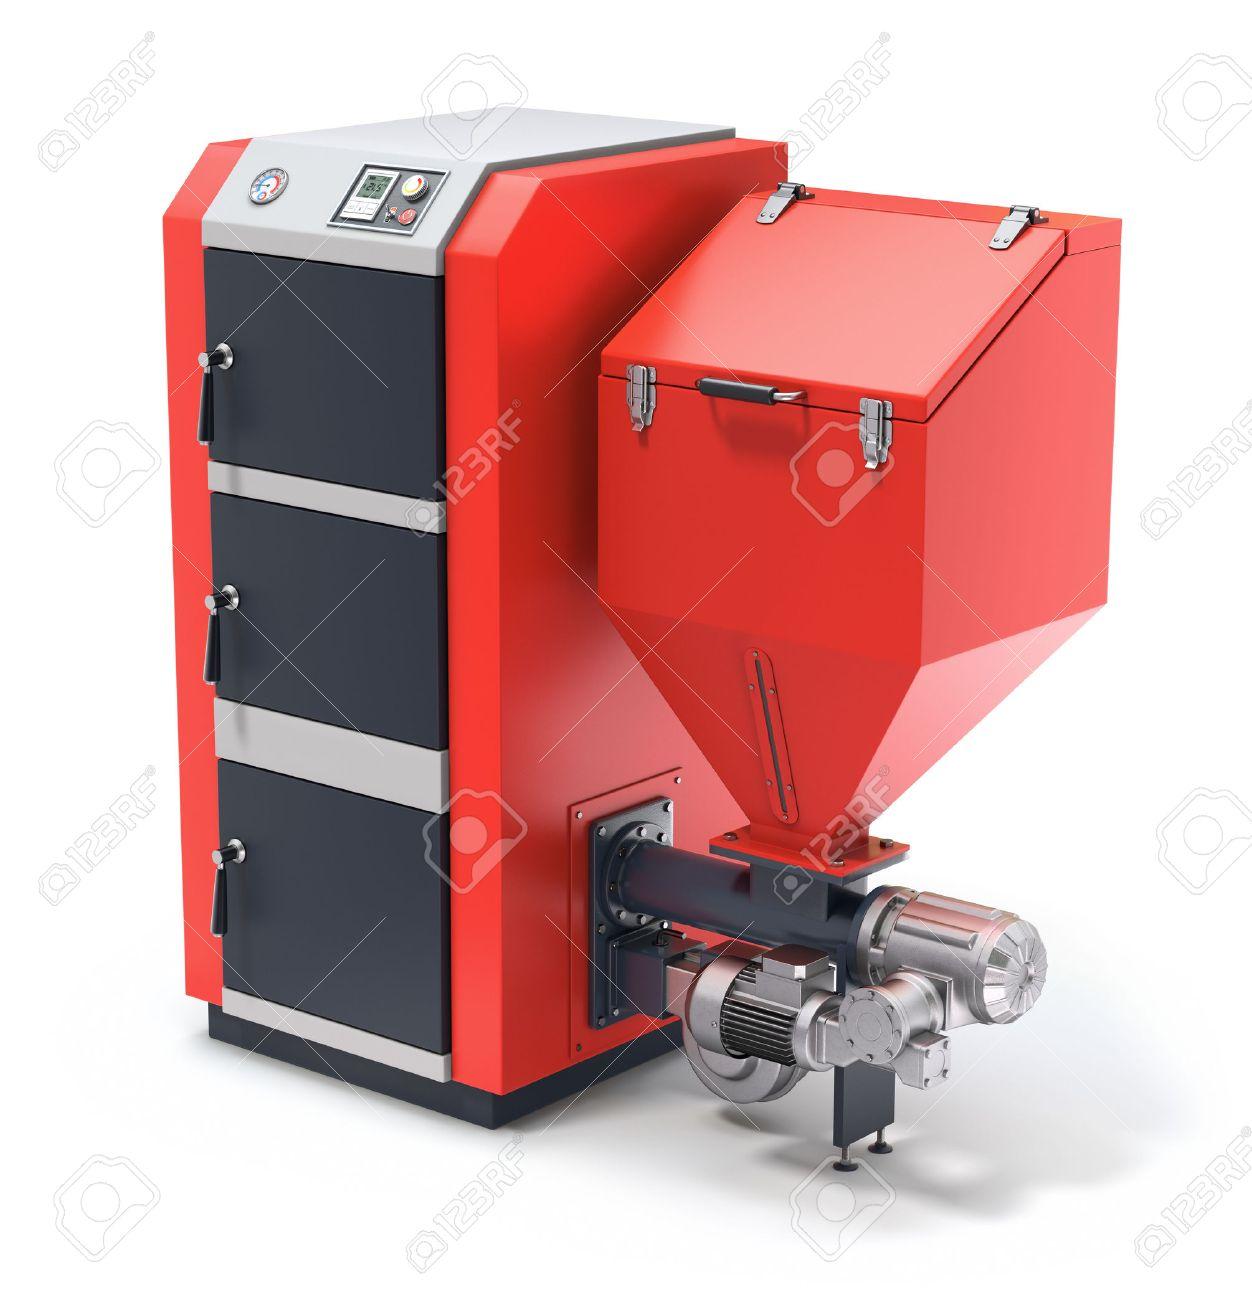 Wood Pellet Boiler >> Wood Pellet Boiler With Fuel Hooper And Feeding System Stock Photo